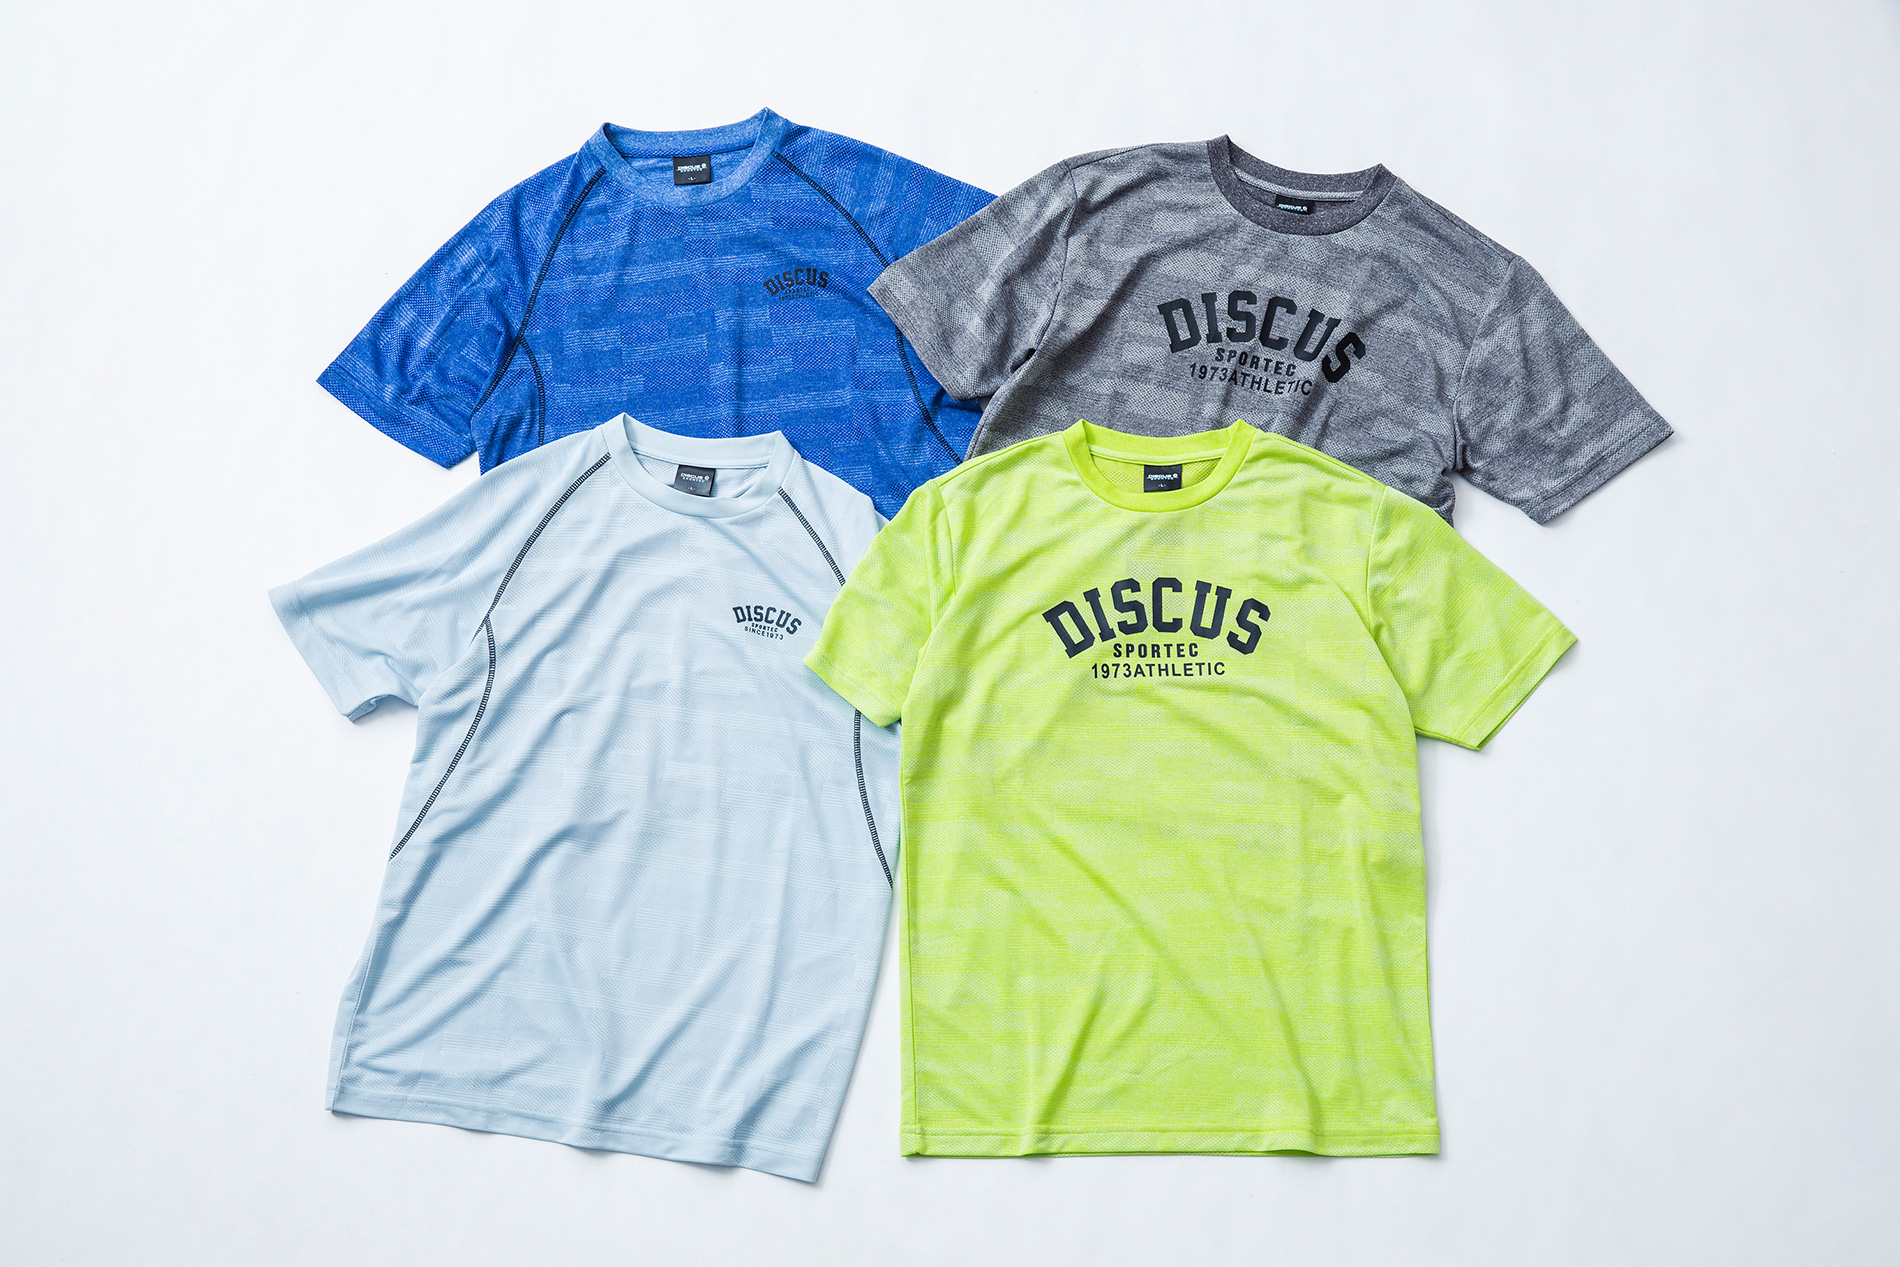 DISCUS(ディスカス)のスポーツライン。